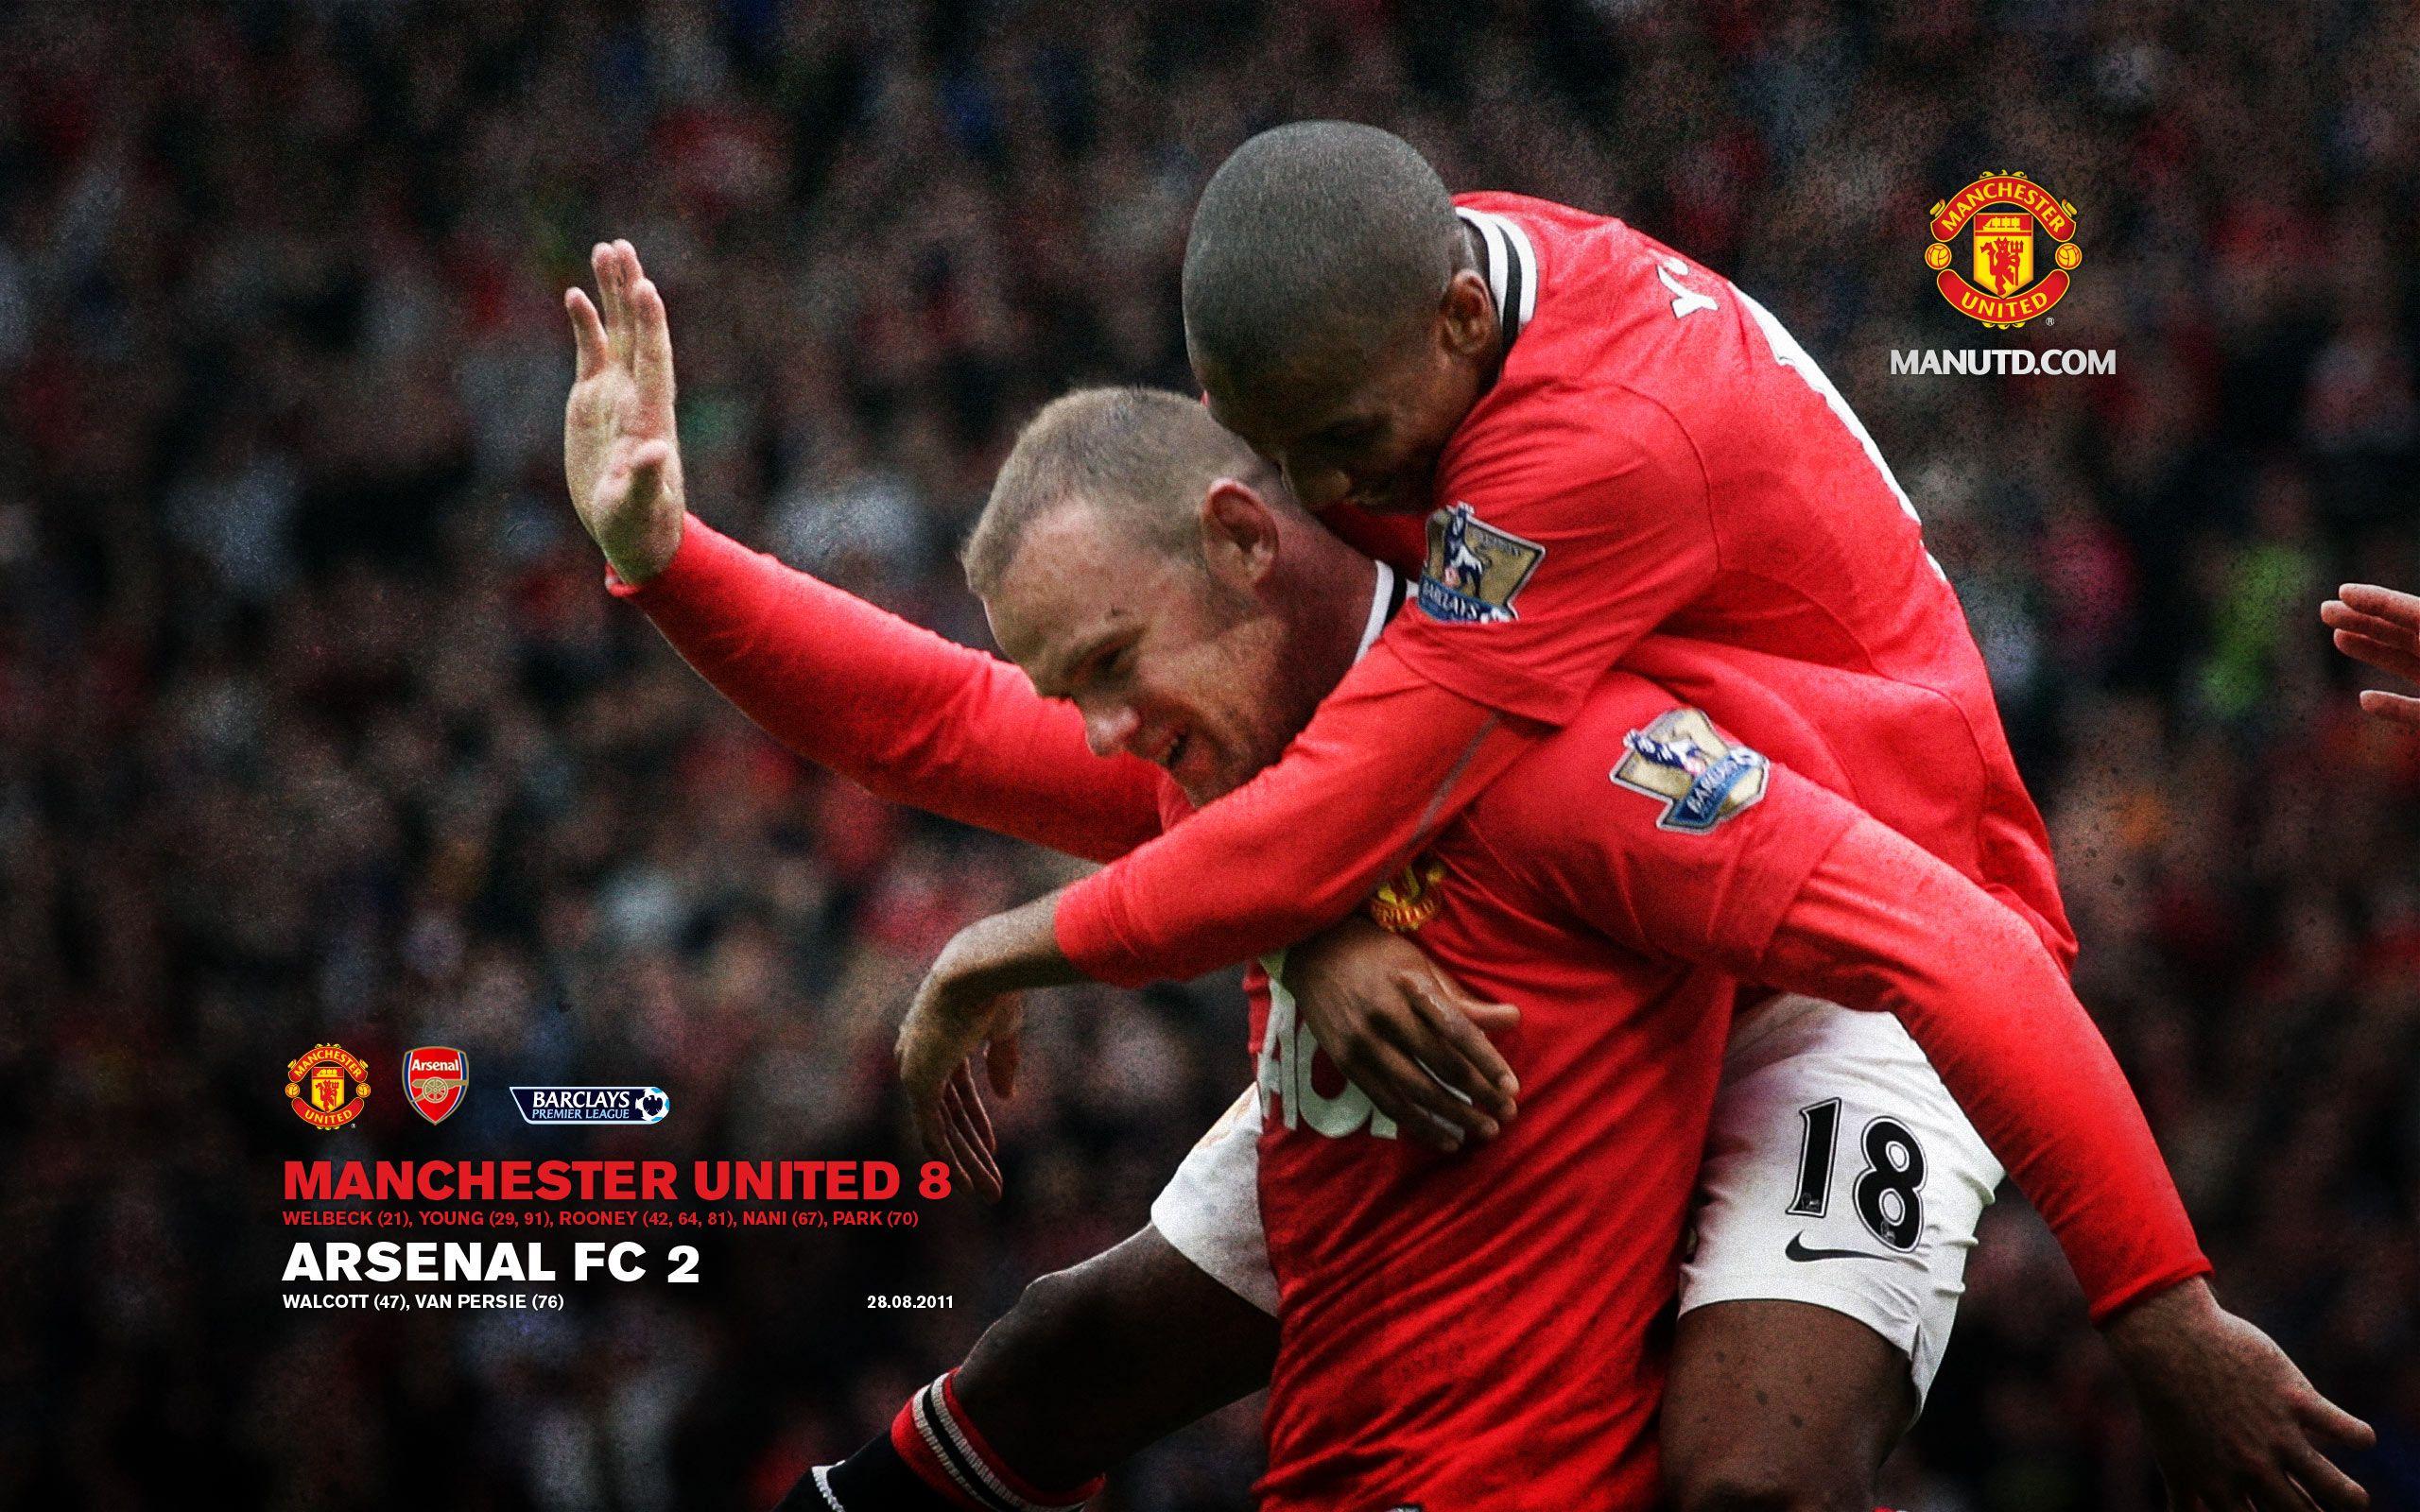 2011 8 28 Manchester United 8 2 Arsenal Manchester United Manchester United Football Club Manchester United Football